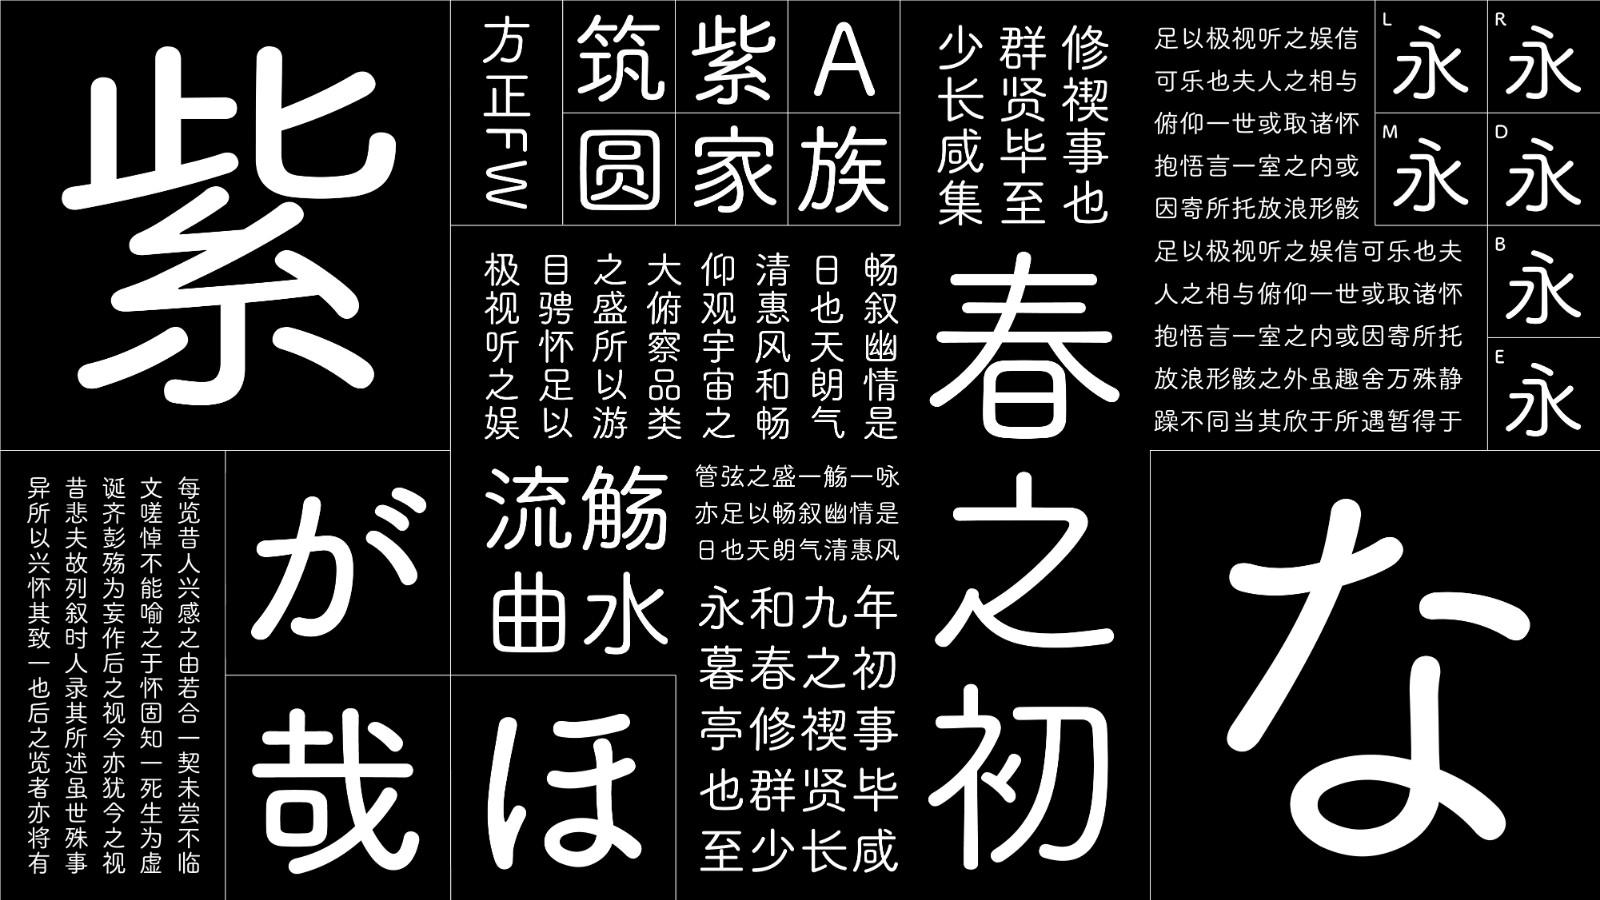 https://ft-bk1.oss-cn-zhangjiakou.aliyuncs.com/Public/Uploads/img/n_content_20201210175729_9759.jpg